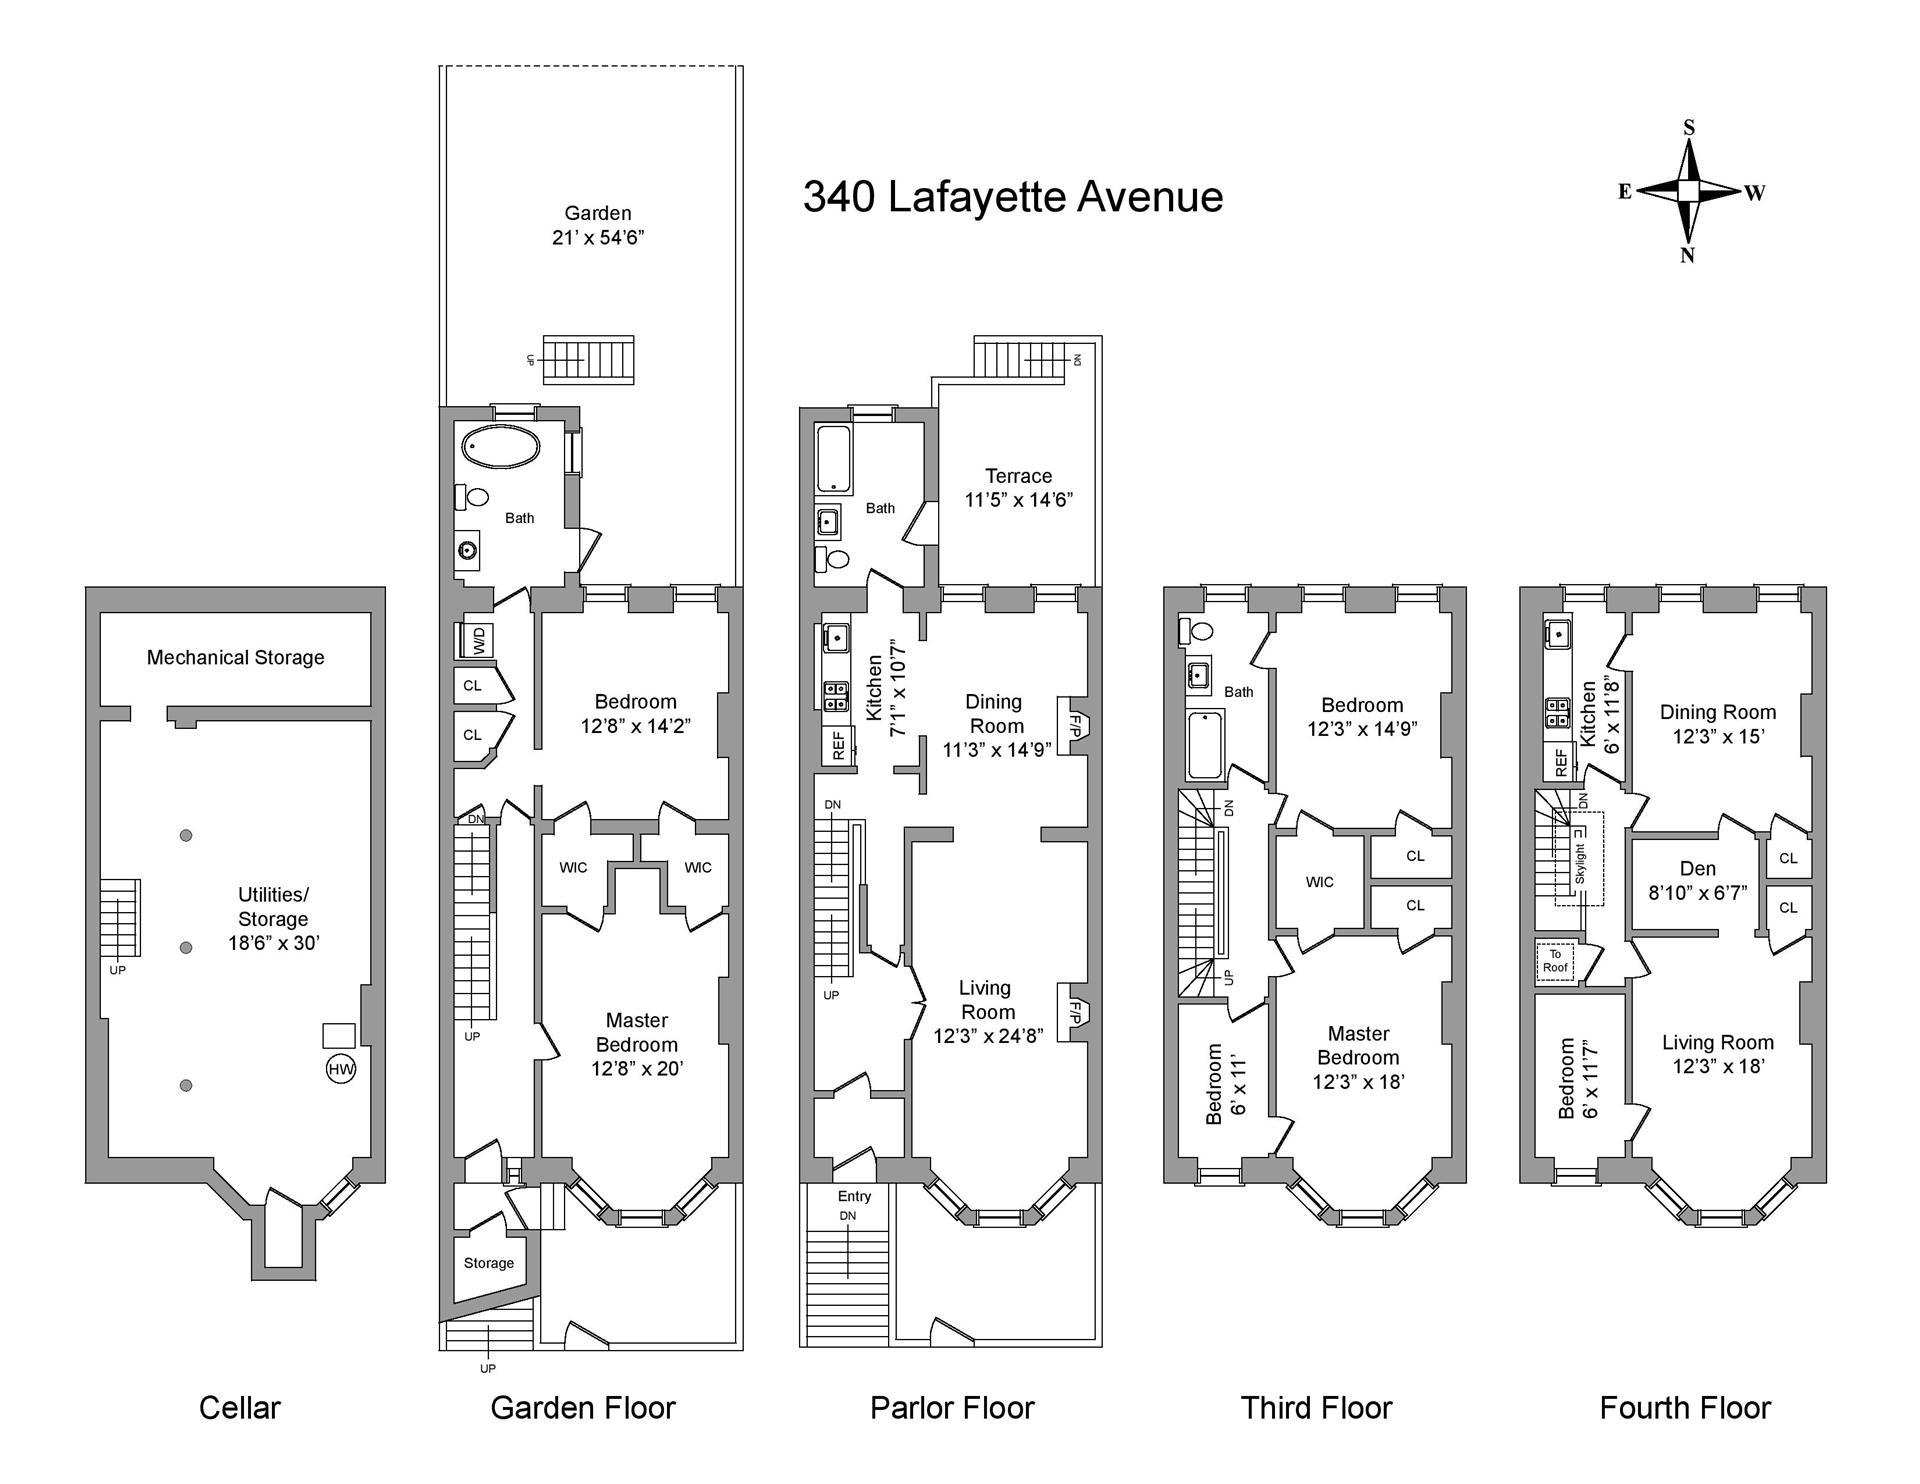 Floor plan of 340 Lafayette Avenue - Clinton Hill, New York